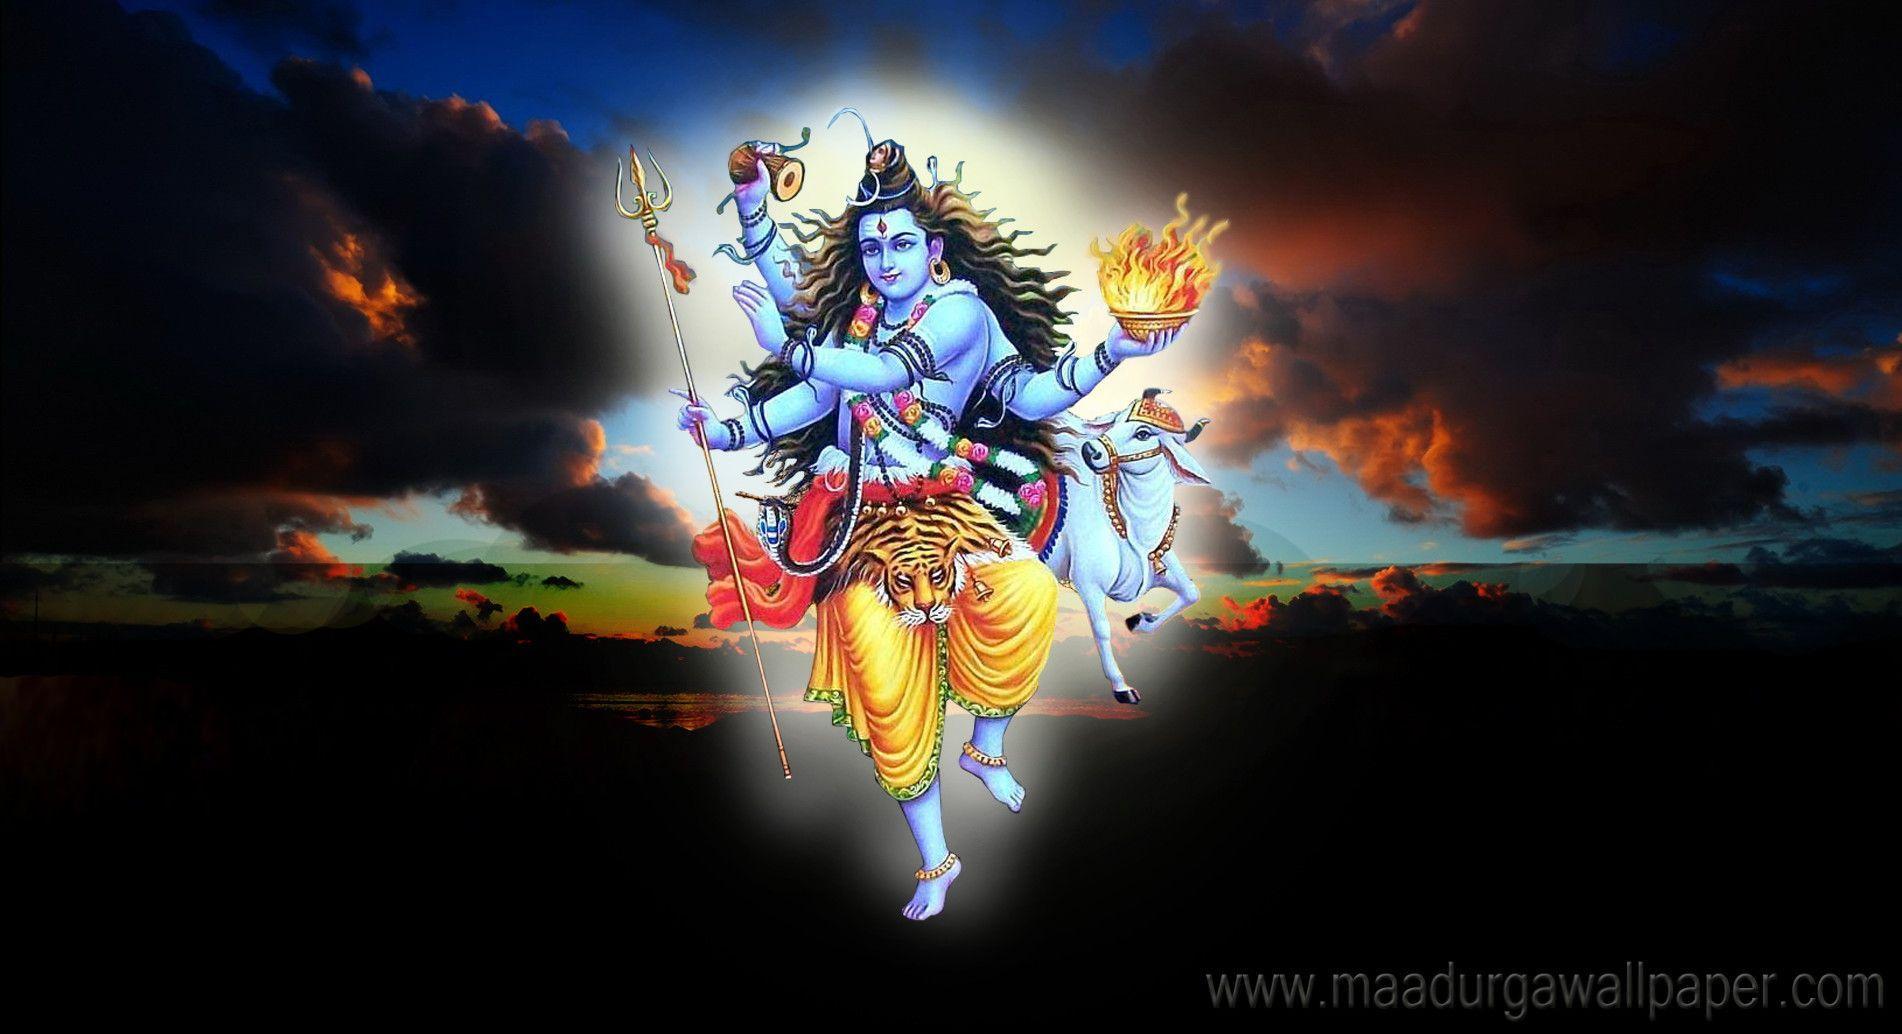 Mahakal Hd Wallpapers Top Free Mahakal Hd Backgrounds Wallpaperaccess